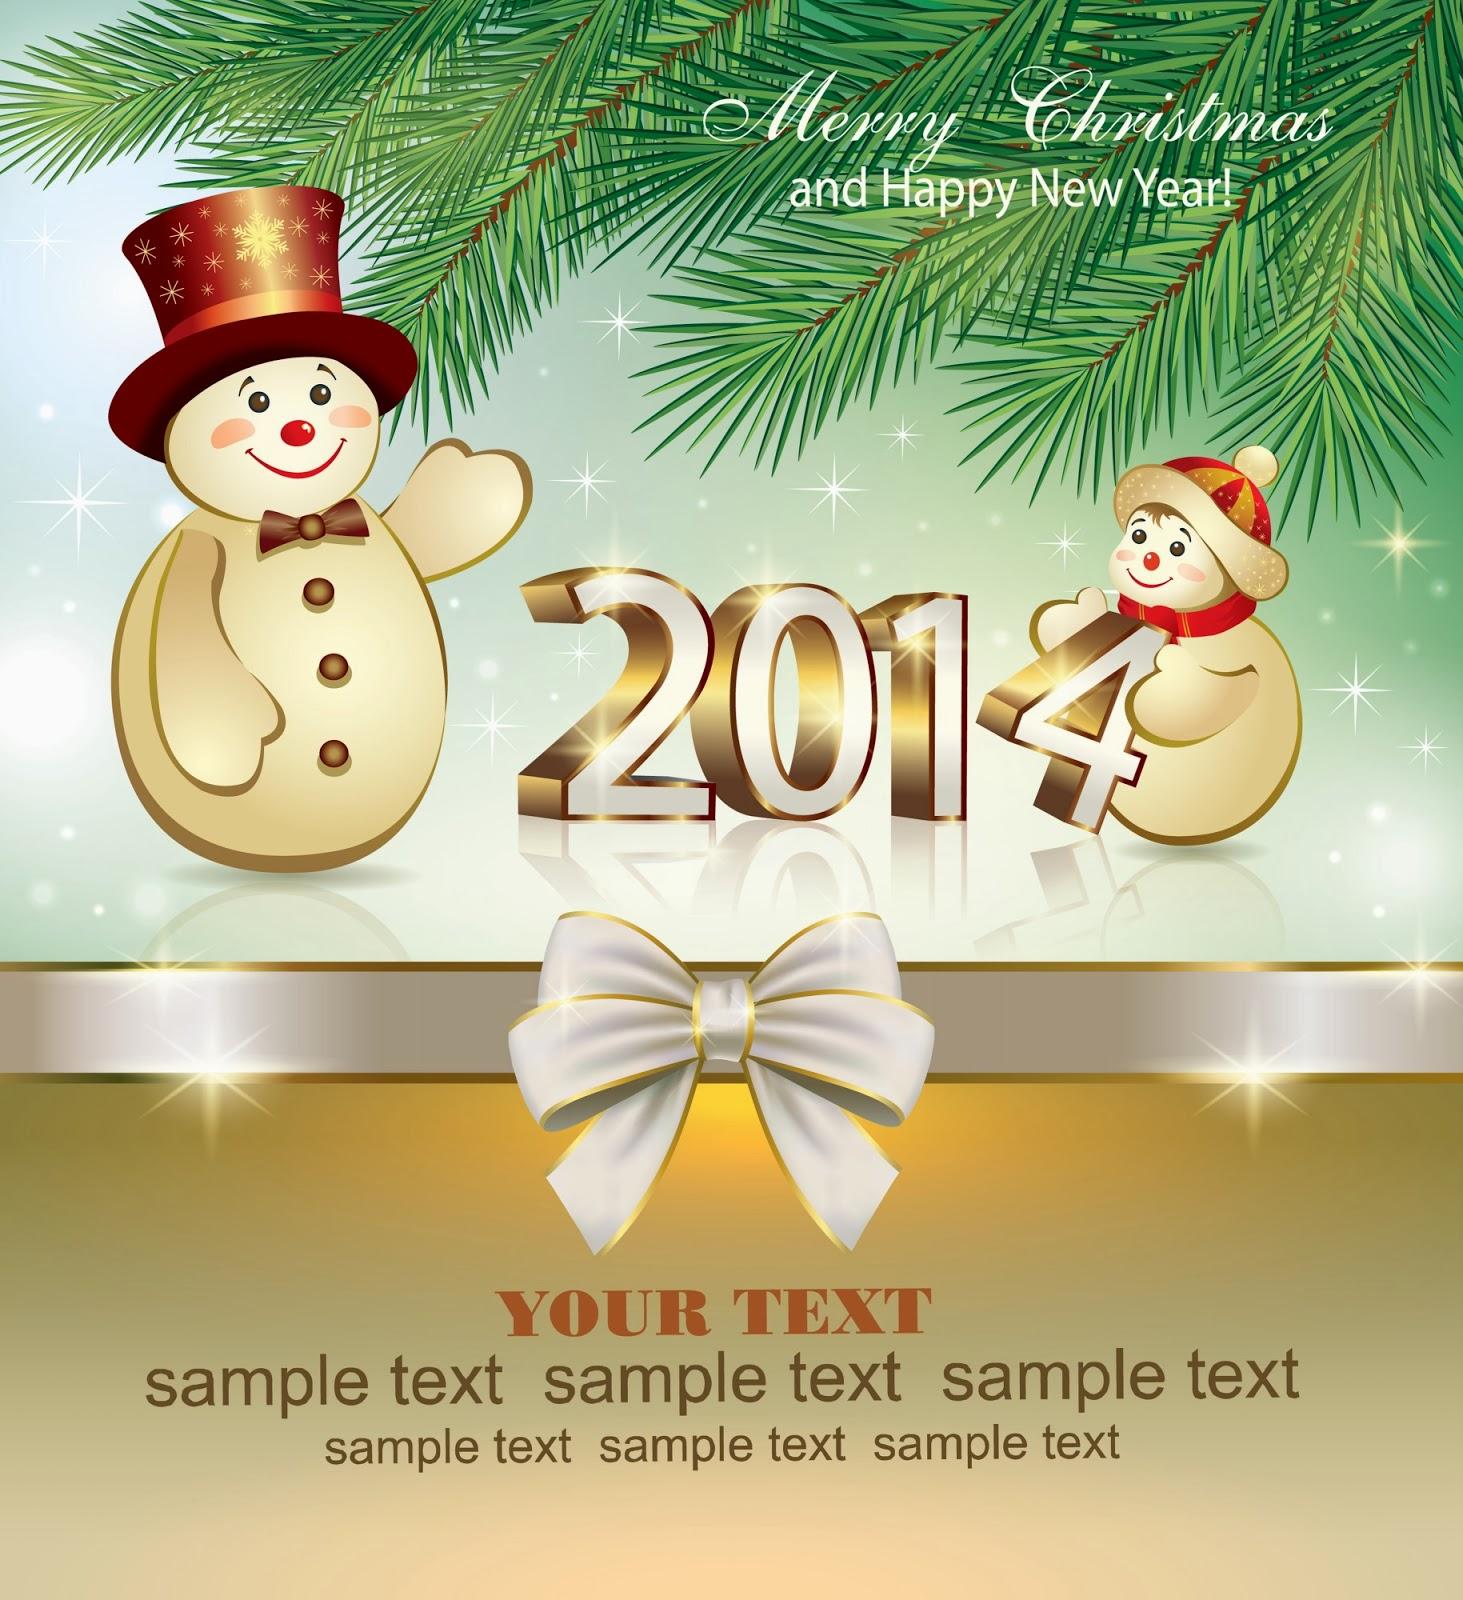 Jim Reeves An Old Christmas Card Lyrics Online Music Lyrics